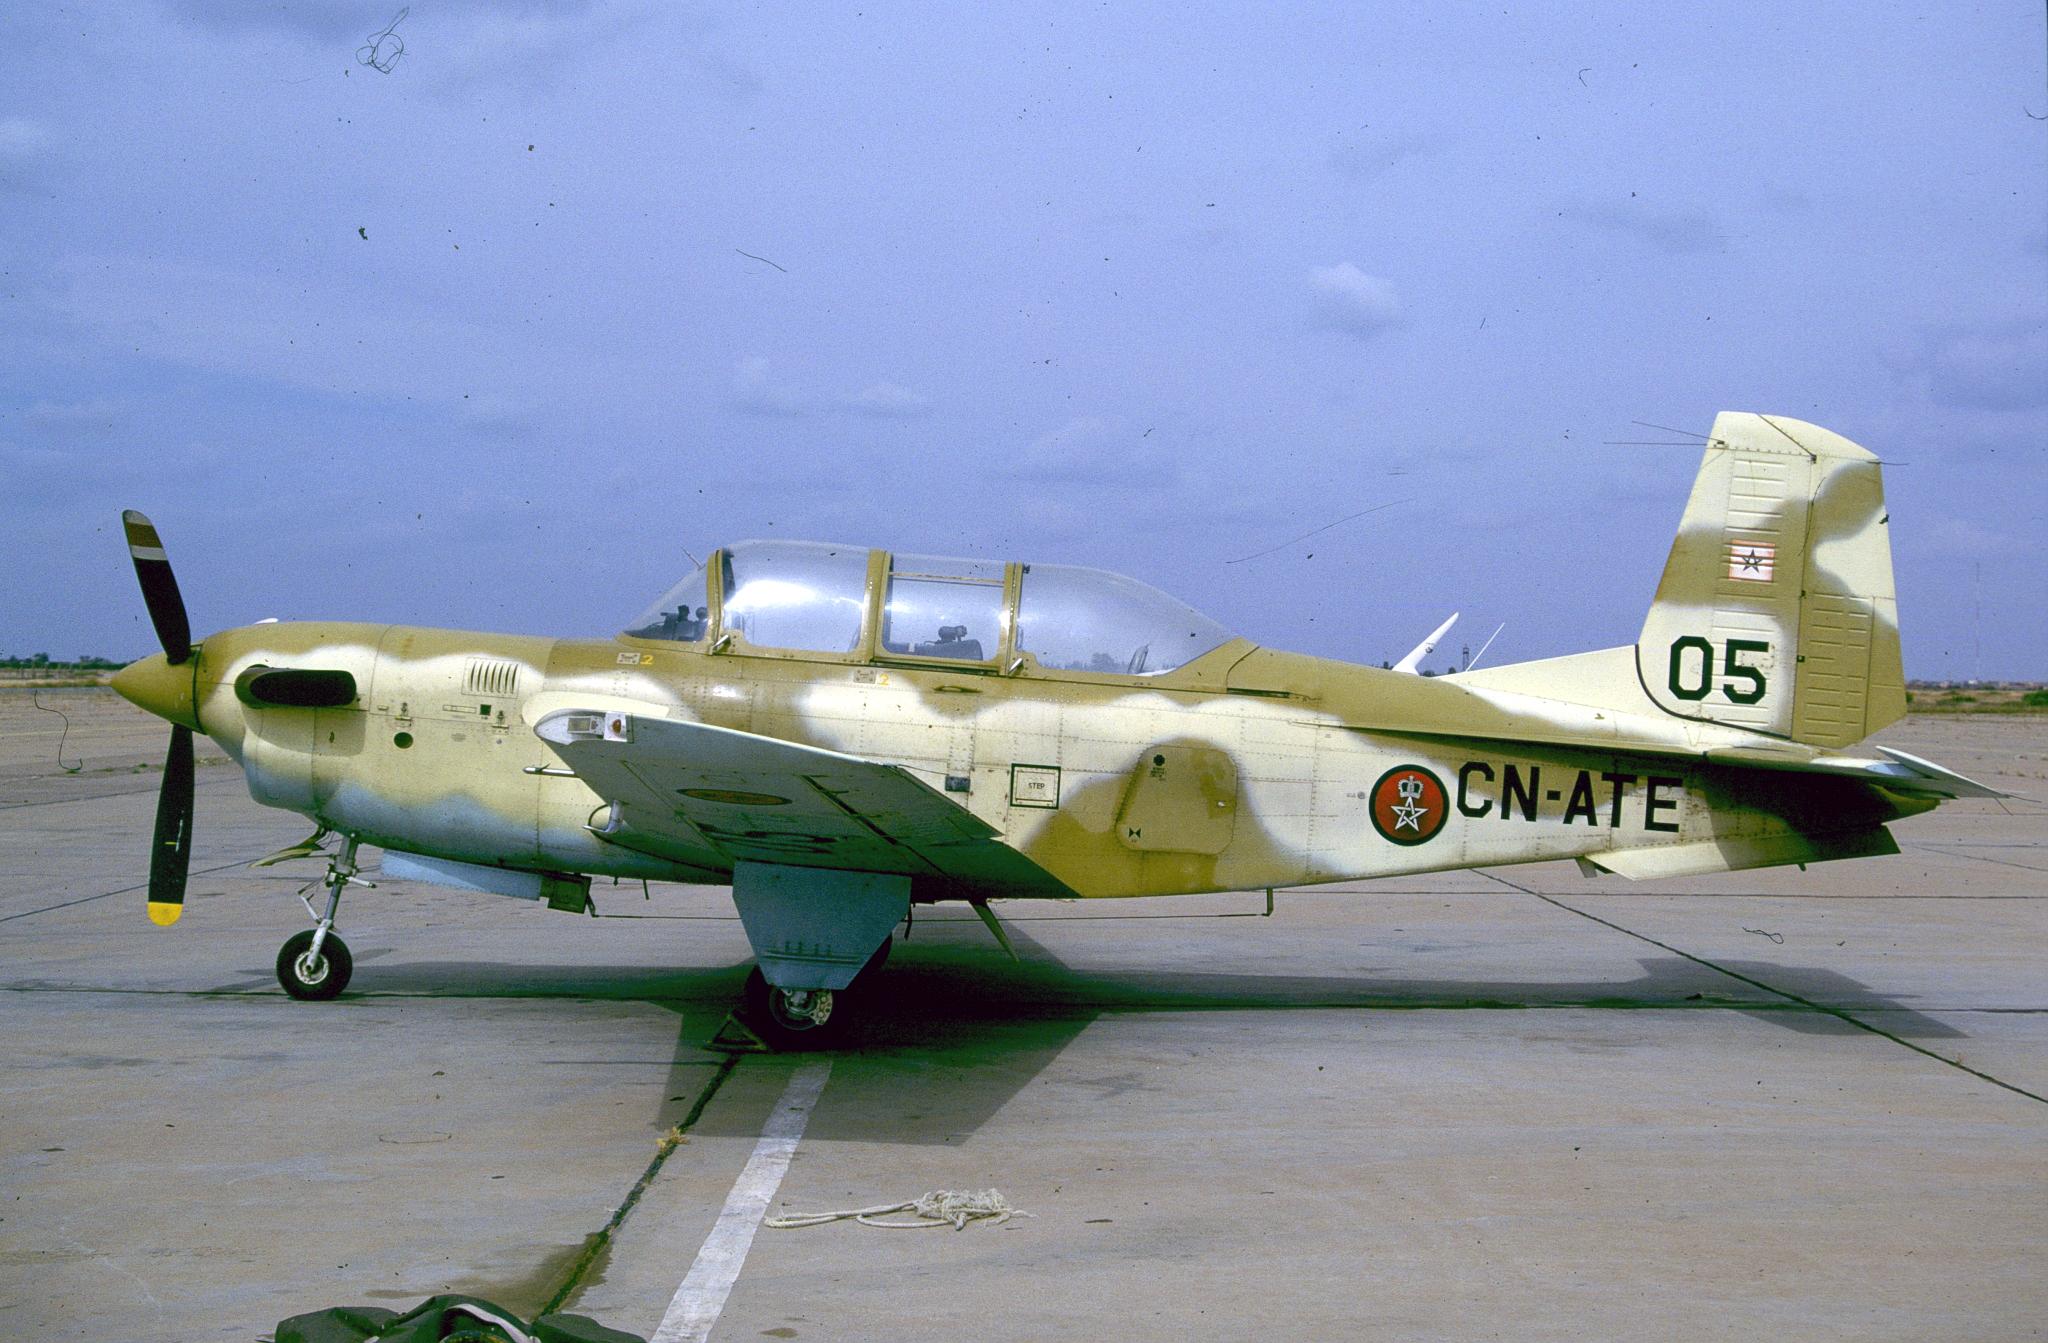 FRA: Photos anciens avions des FRA - Page 7 151226025351501688